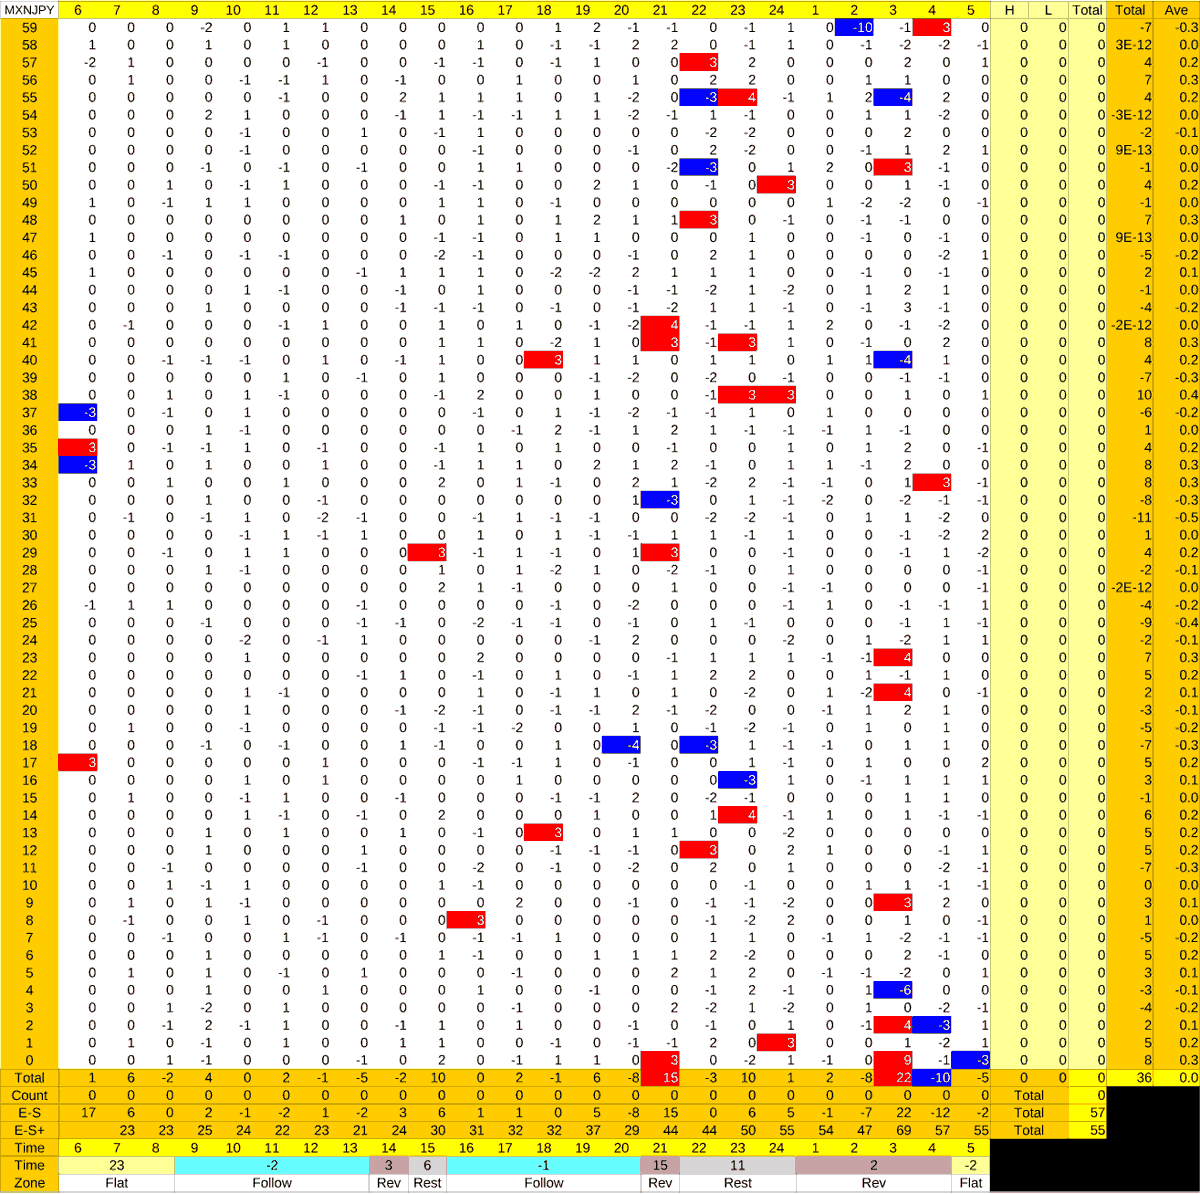 20210428_HS(3)MXNJPY